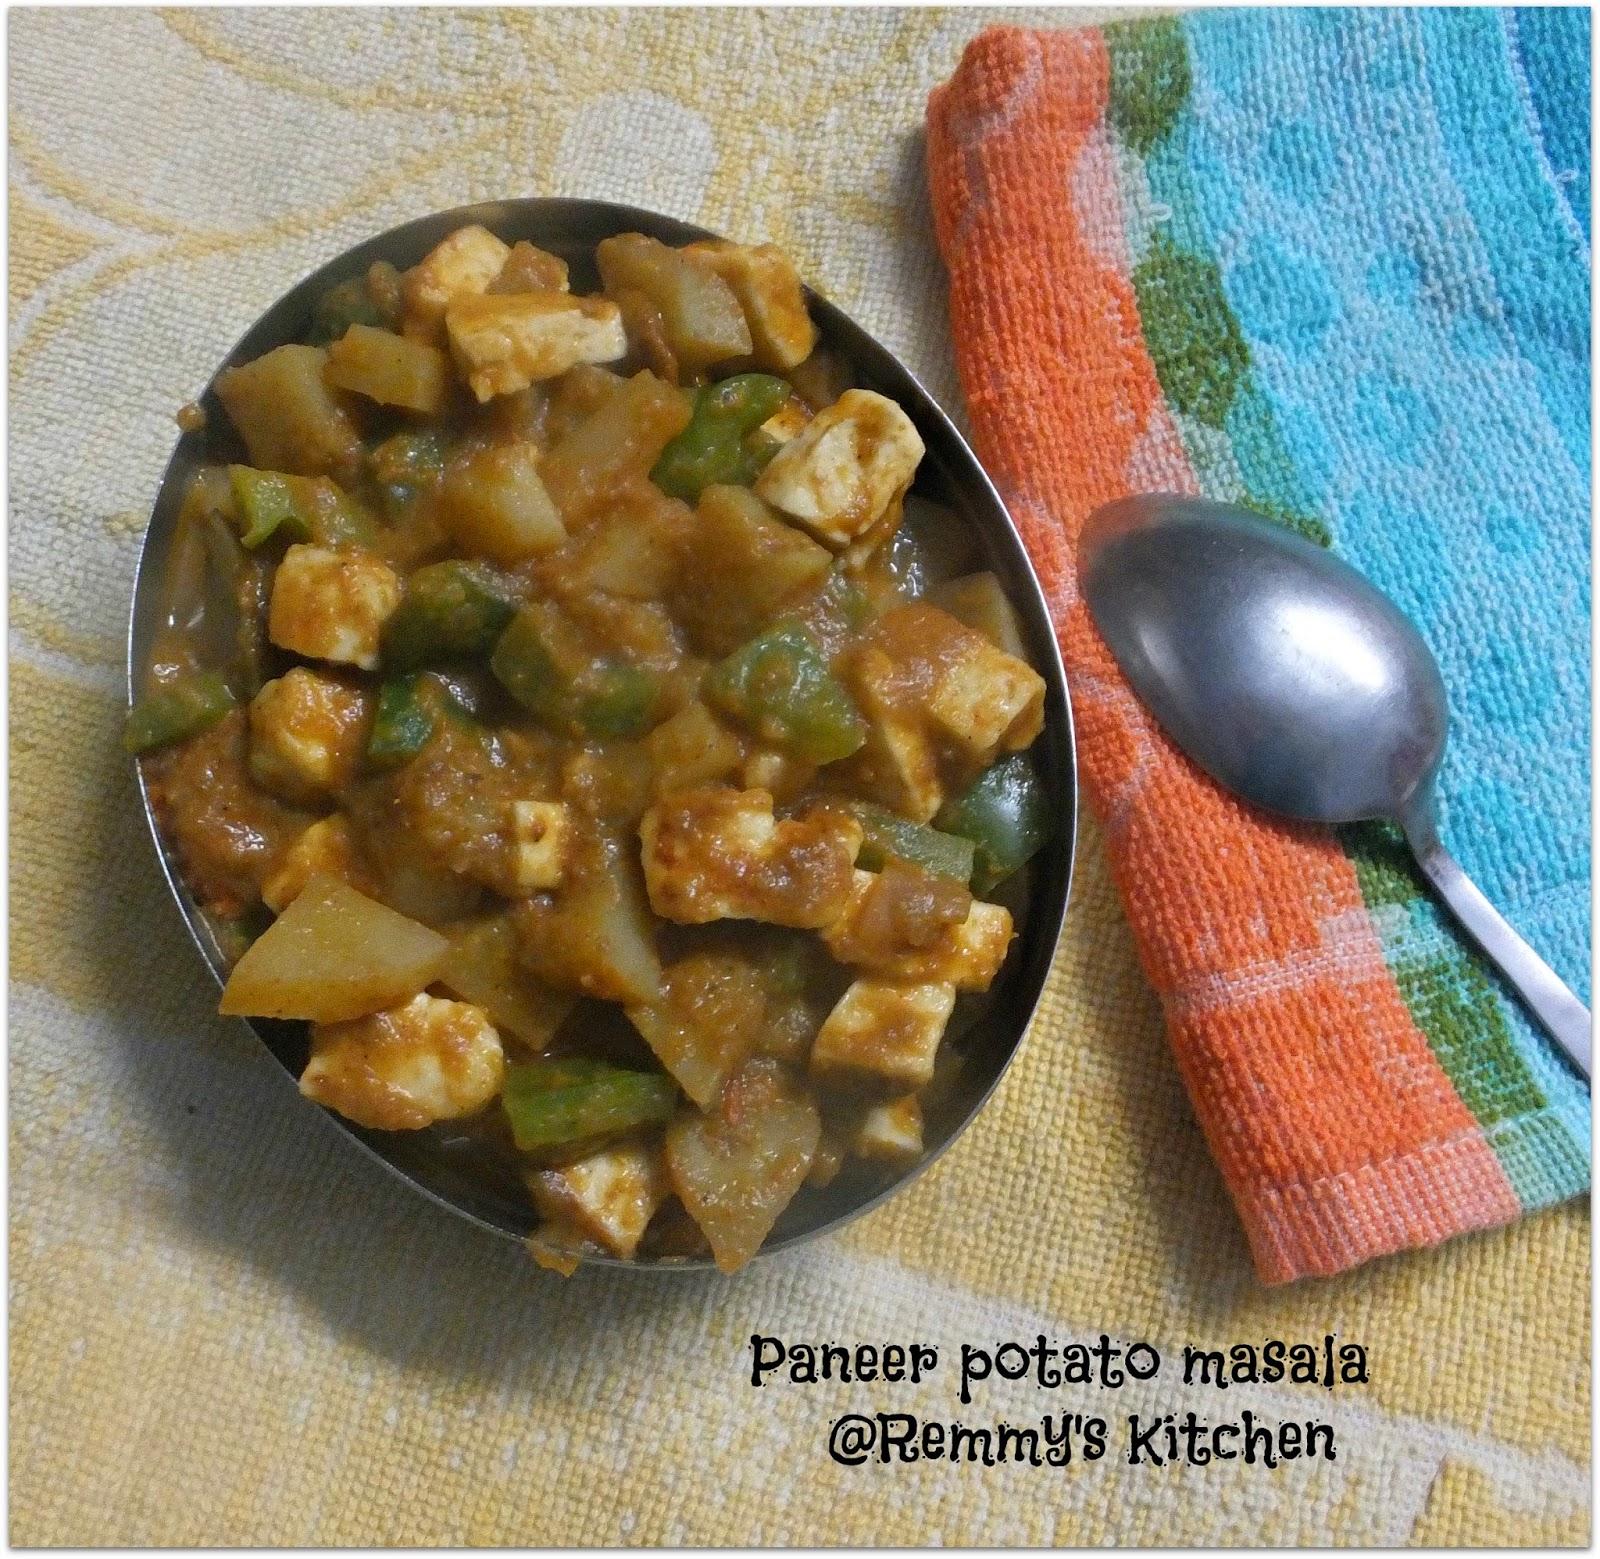 Paneer potato masala